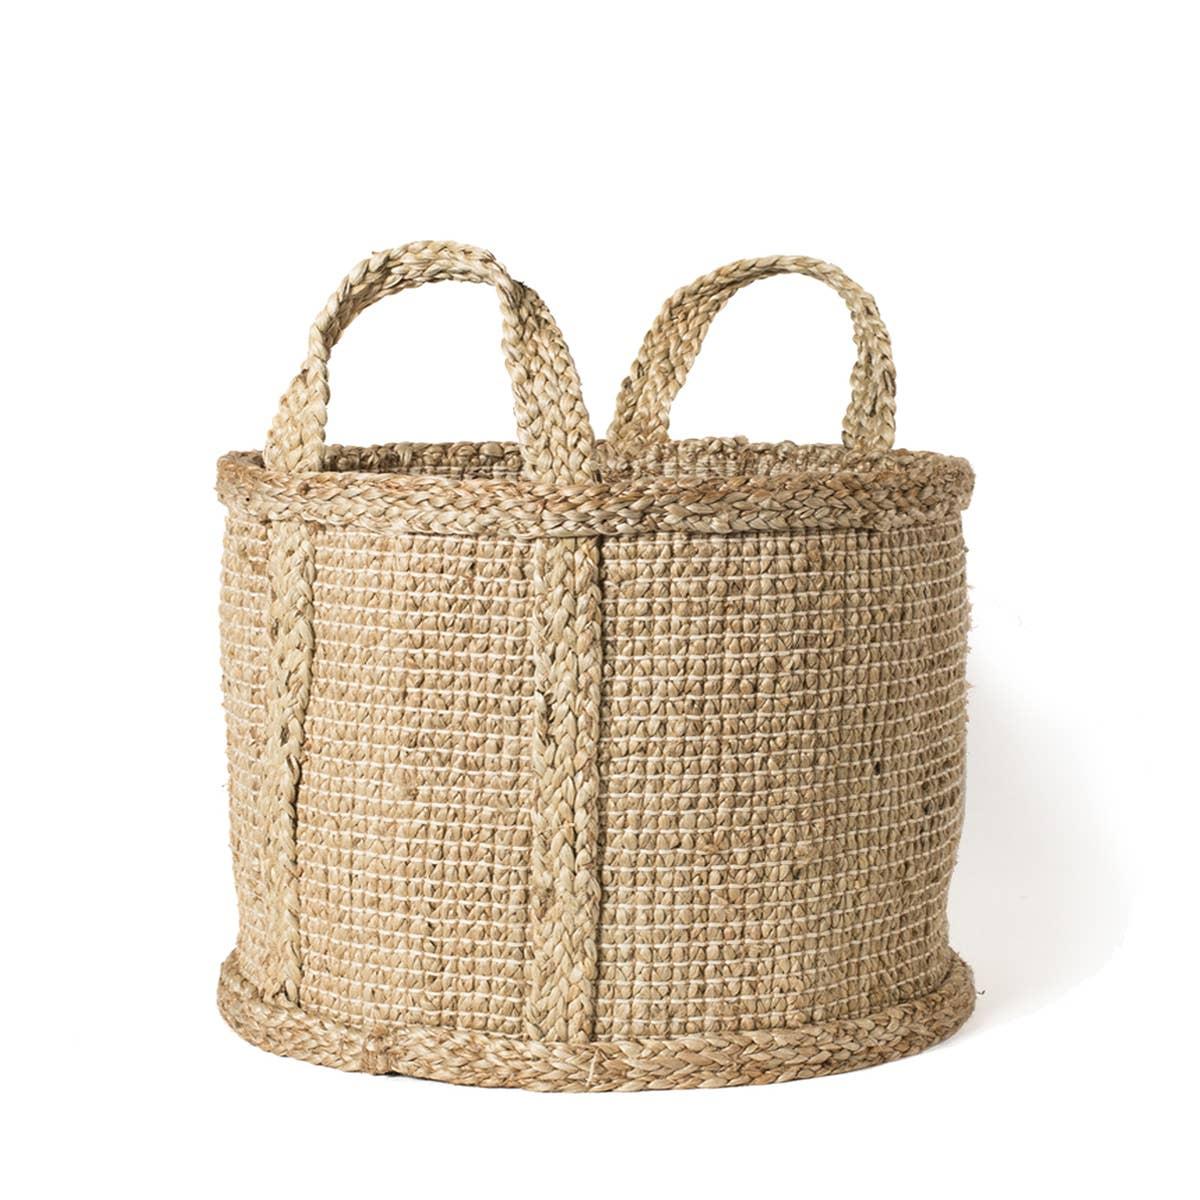 Bono Basket with handle - Natural | Trada Marketplace